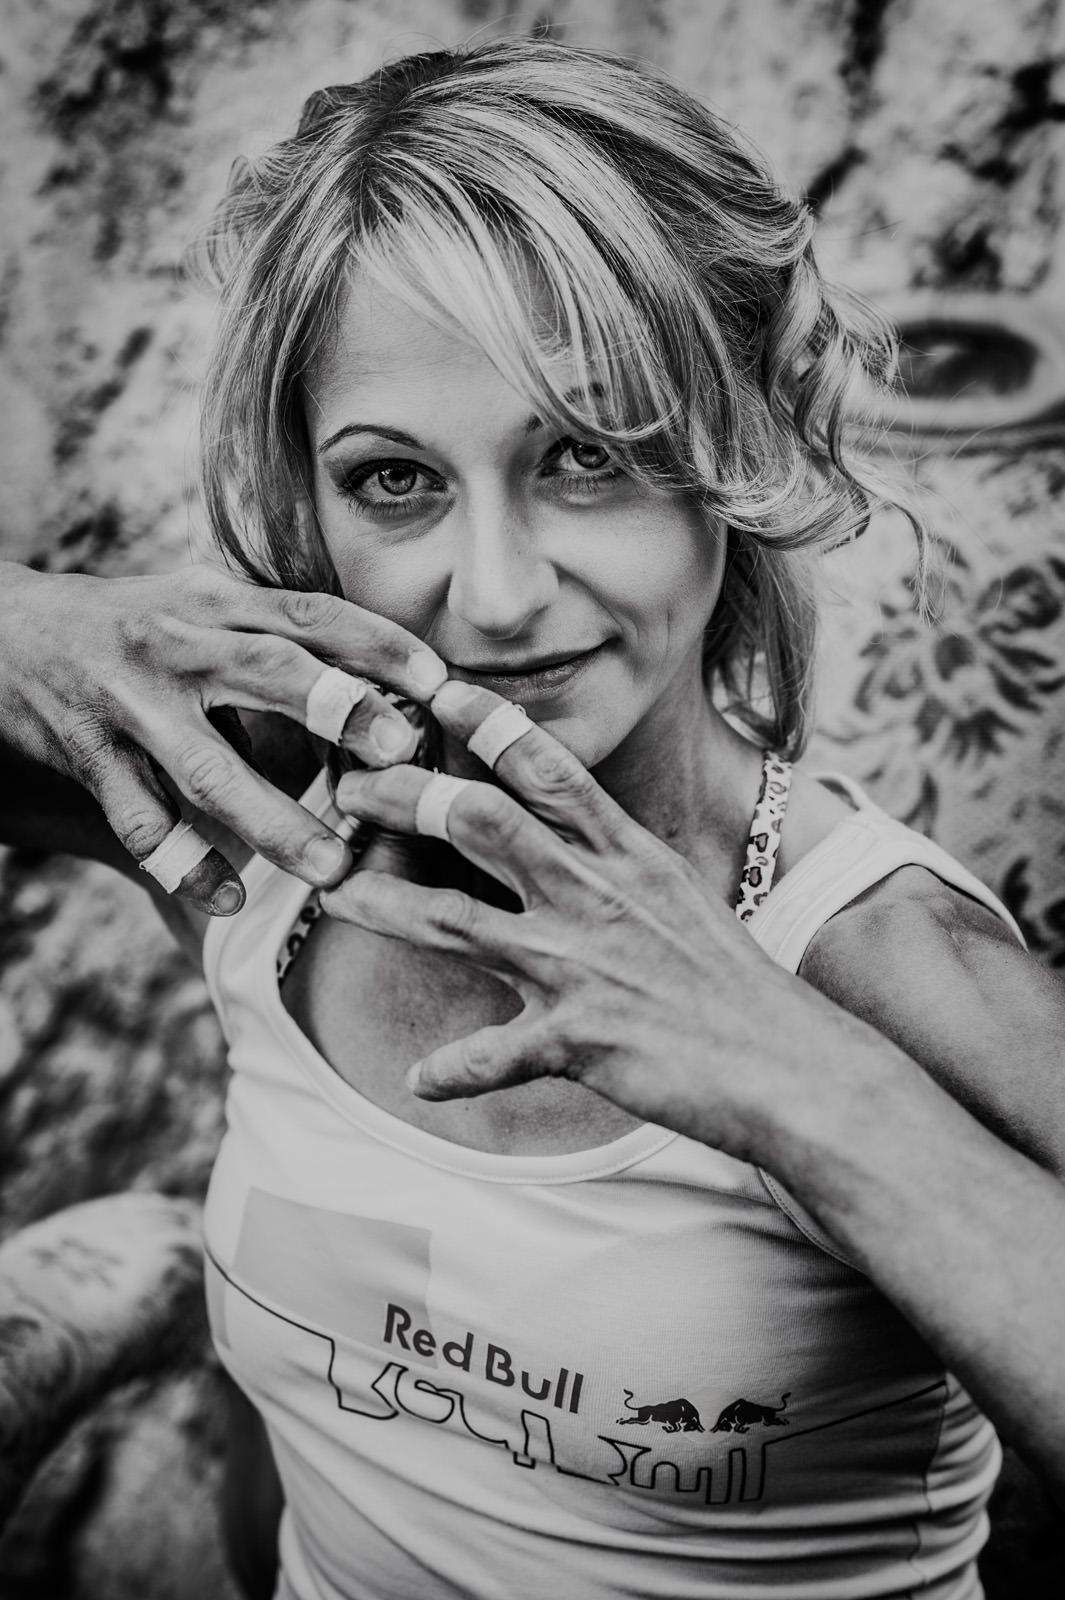 Zanella-Kux Fotografie